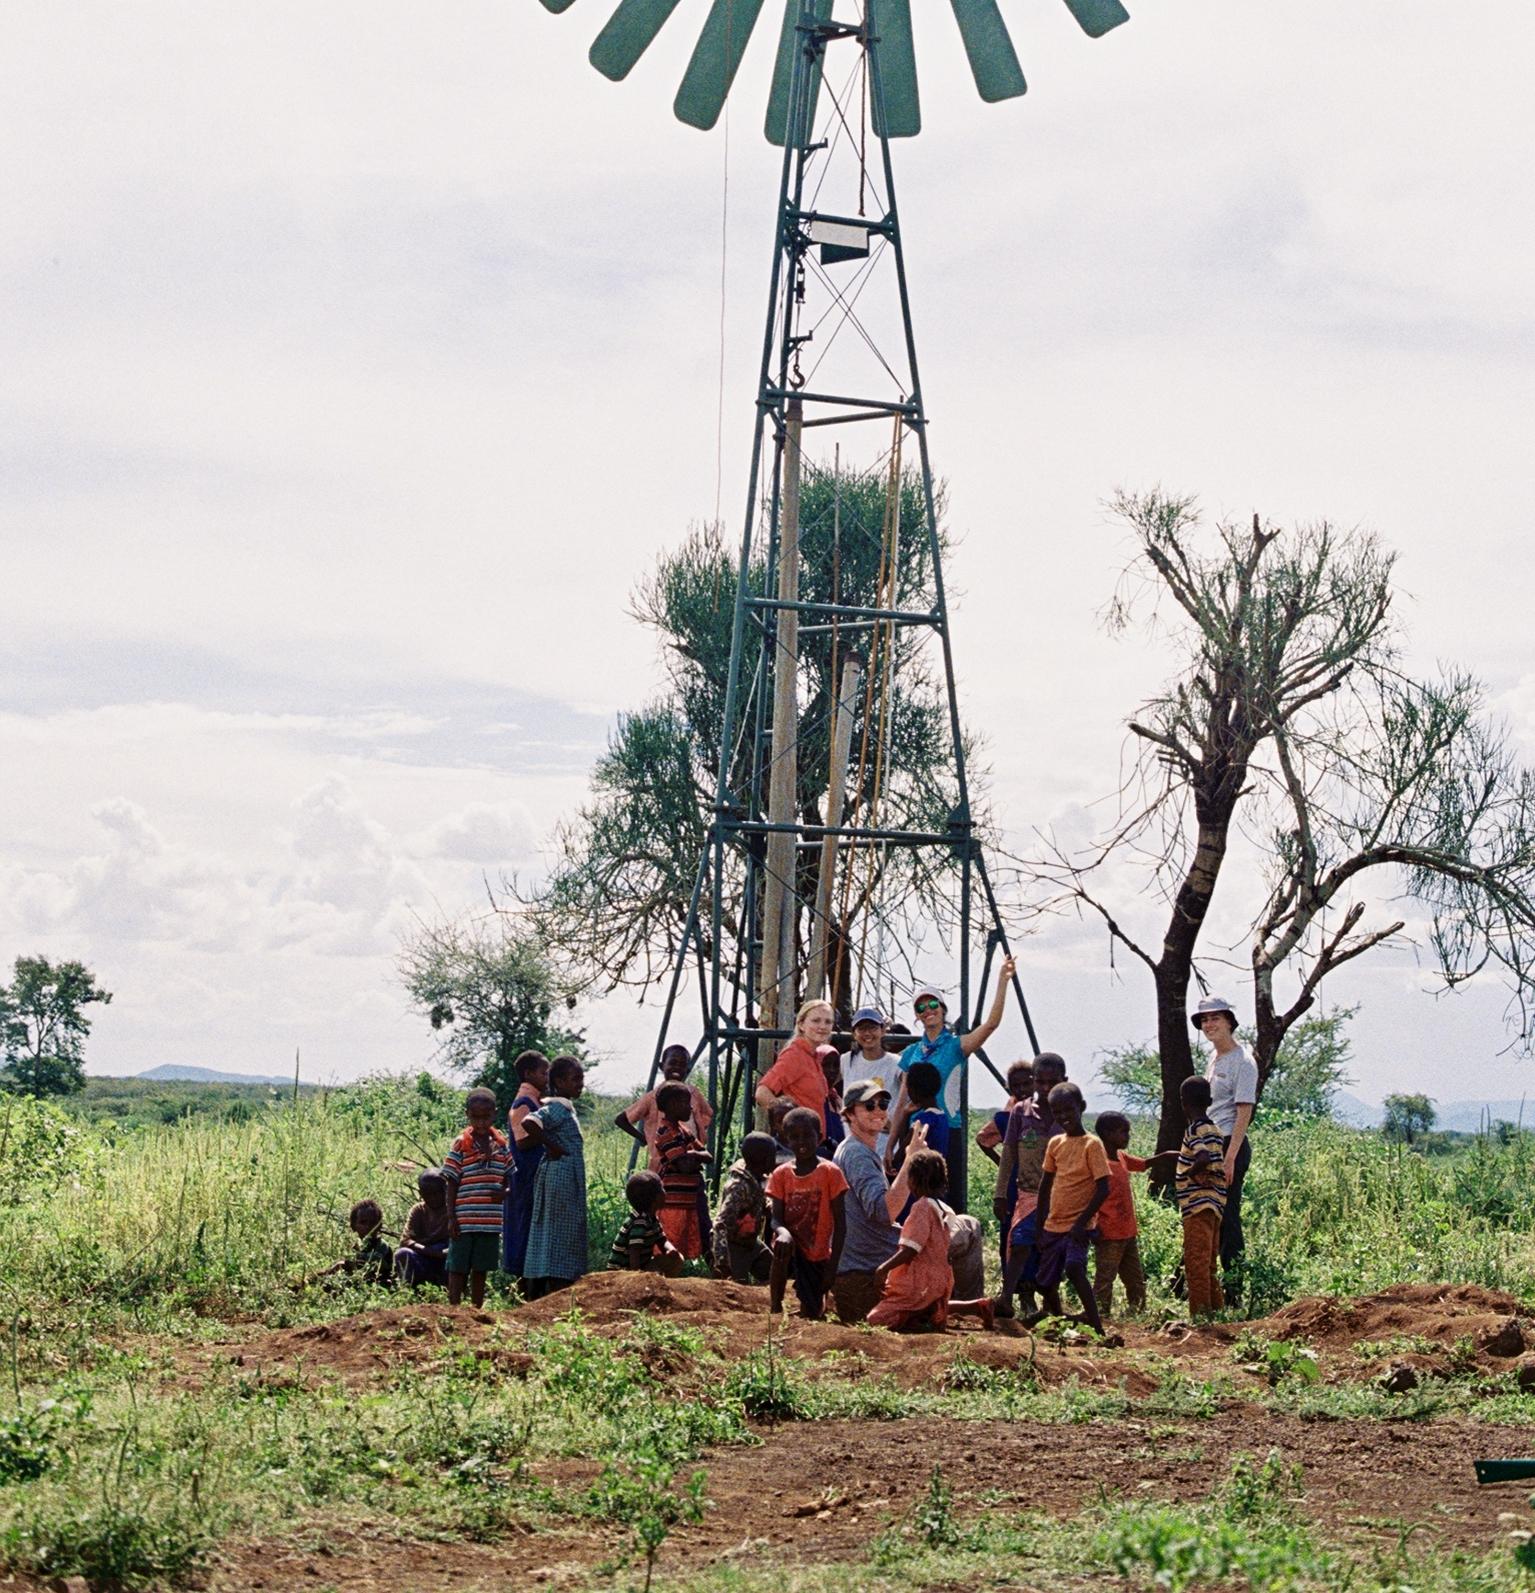 With the Kijito windmill in Gambella, Kenya.